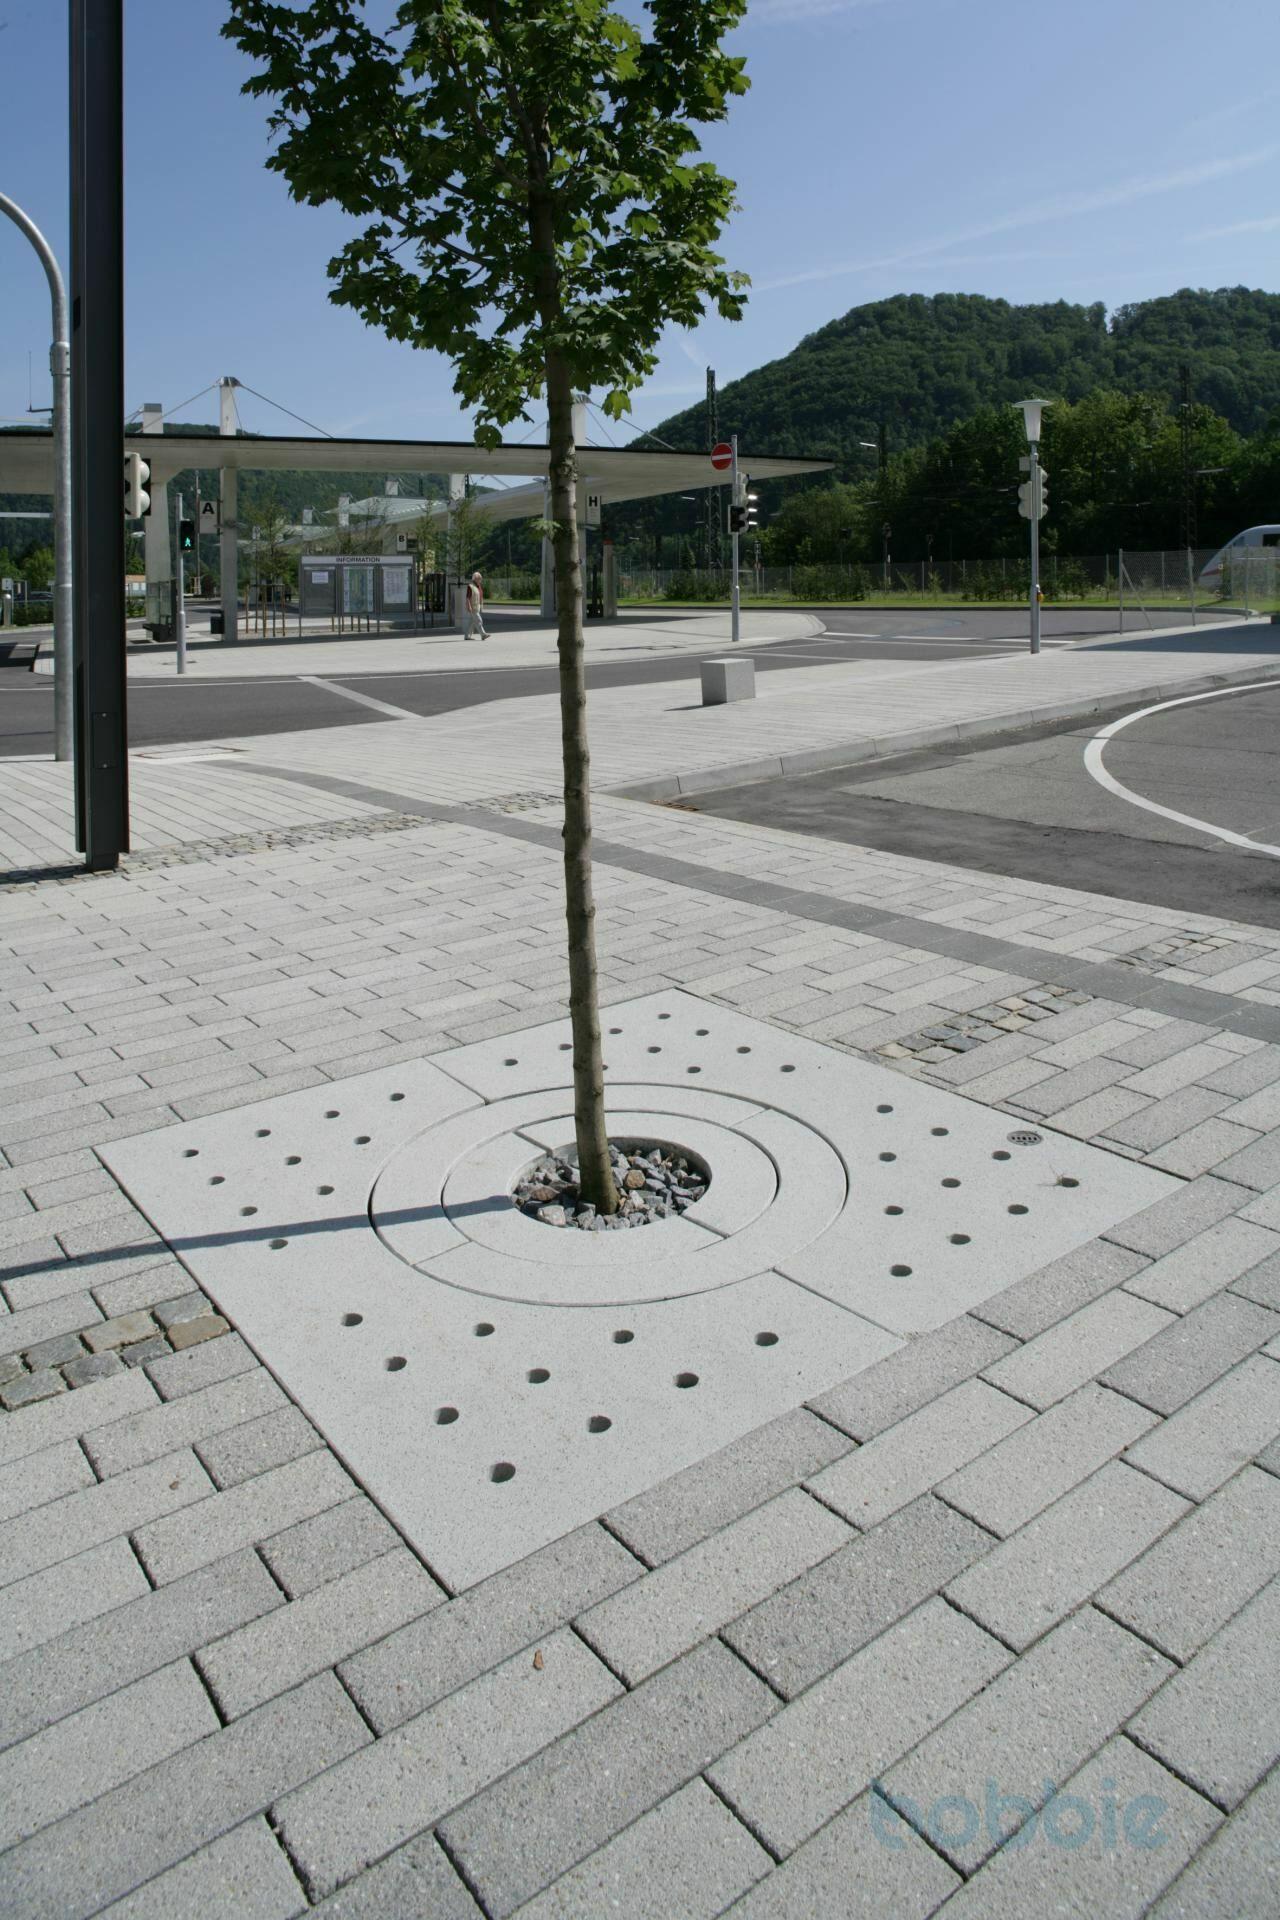 Baumschutz, ARPANA® BAUMSCHEIBE, Typ Berlin, 1800x1800